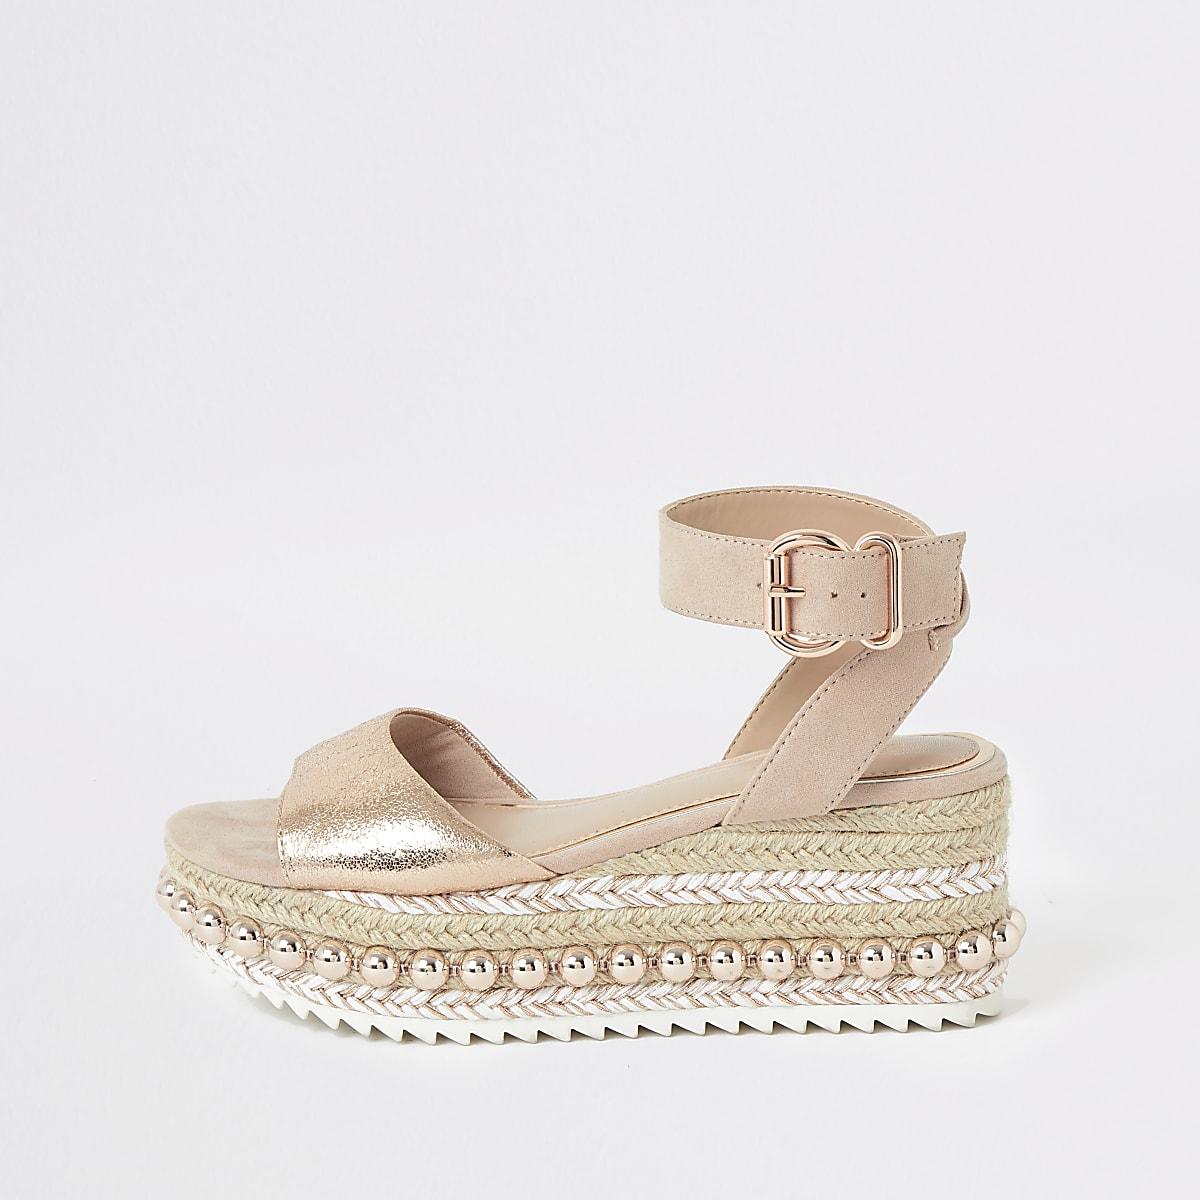 da436434e8 Gold studded flatform espadrille wedges - Sandals - Shoes & Boots - women